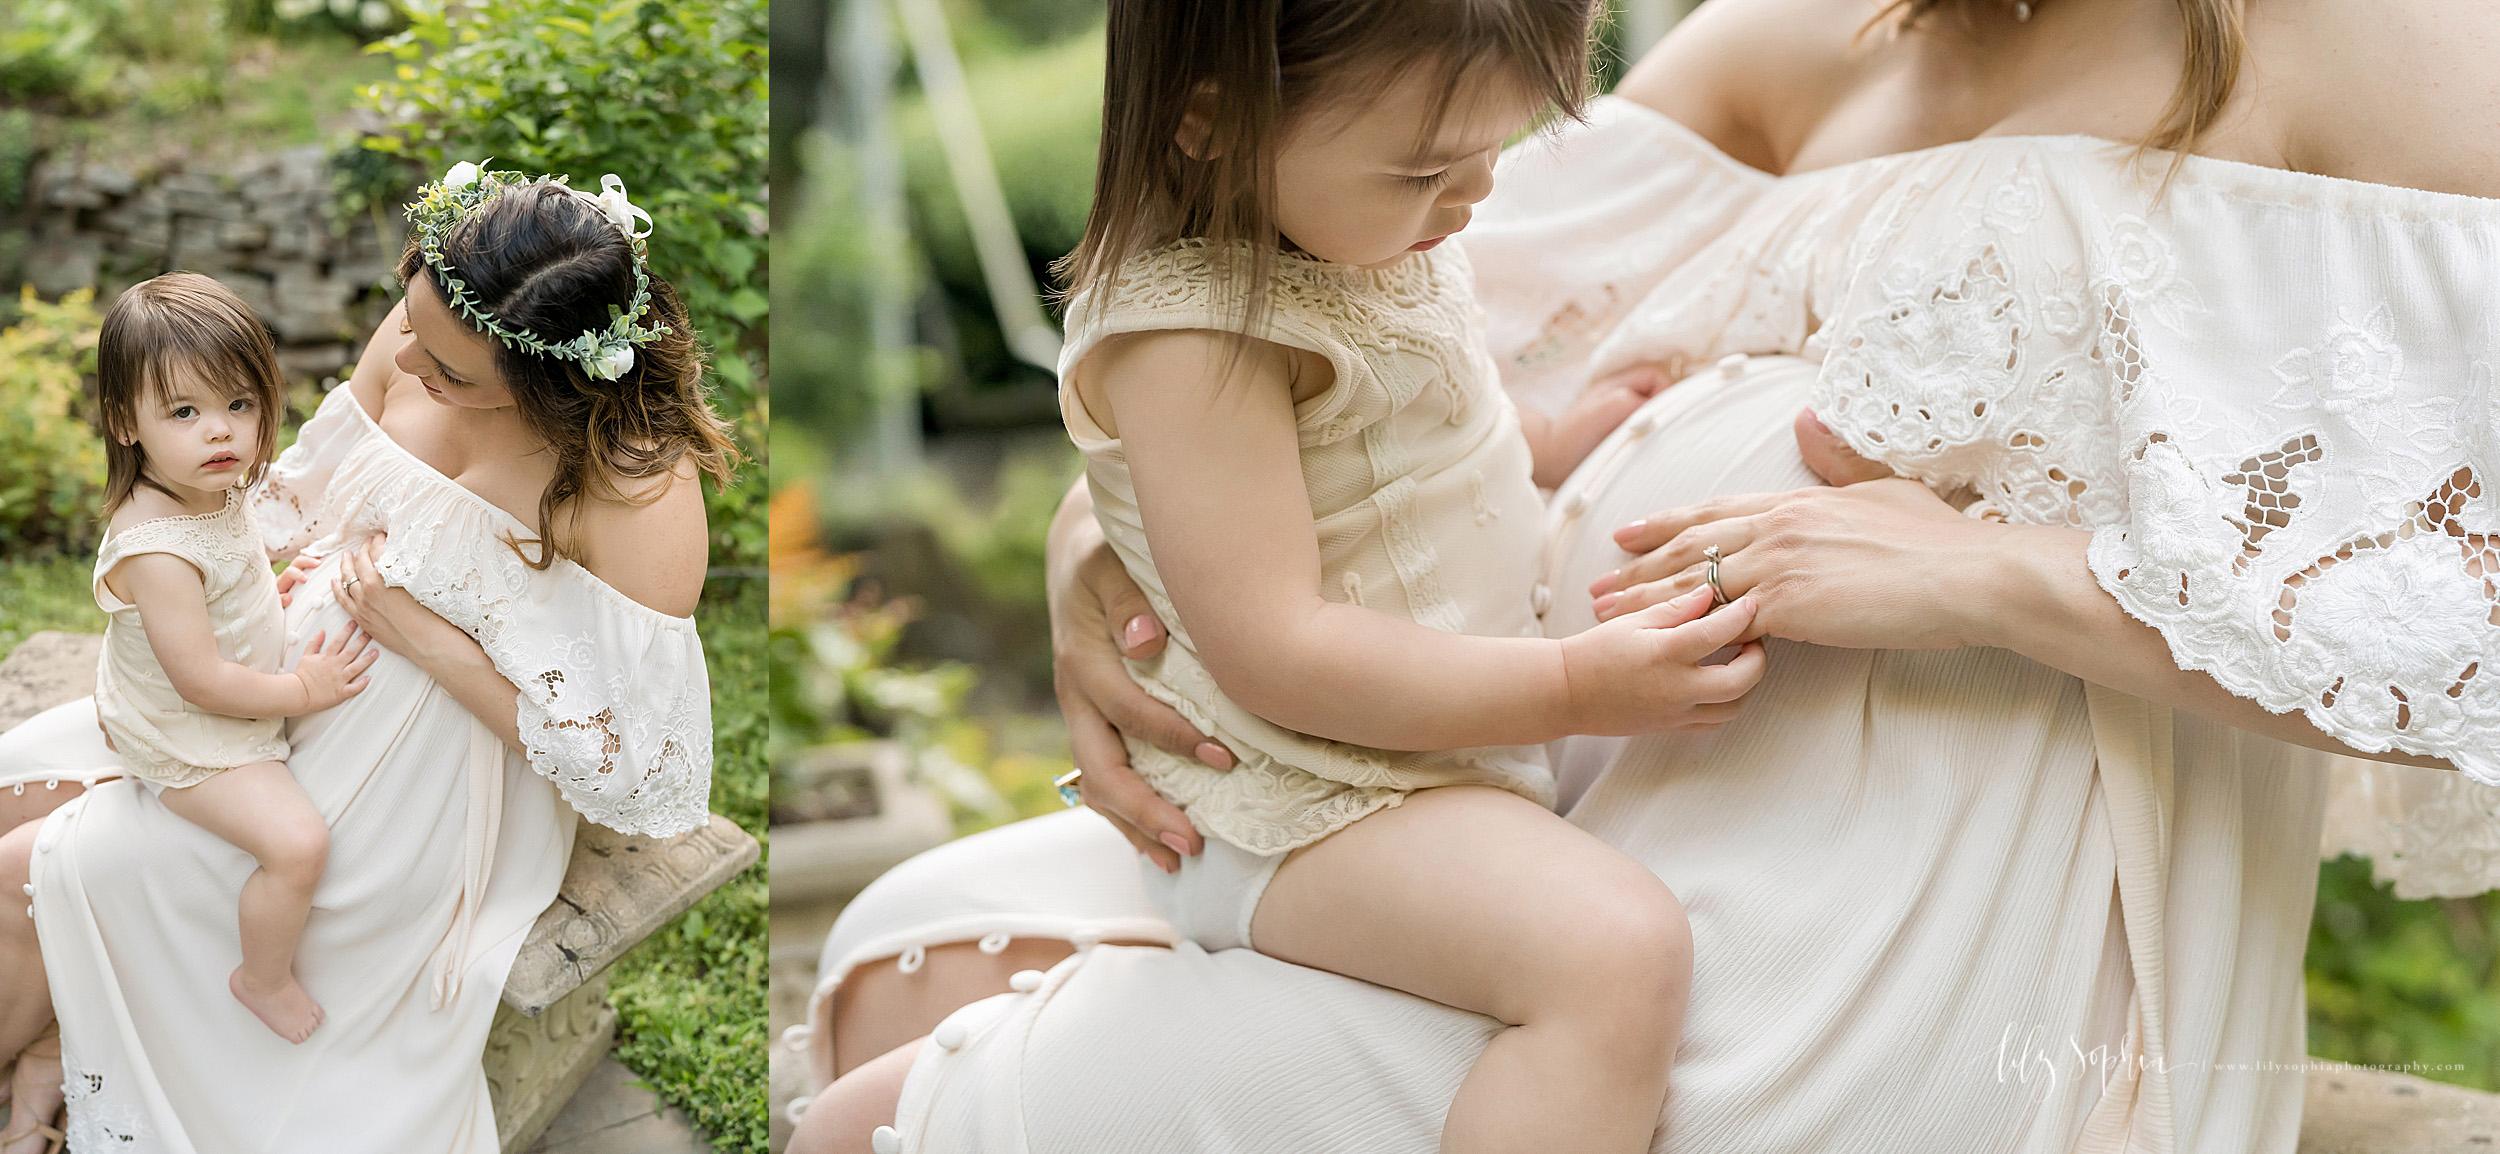 atlanta-decatur-acworth-candler-park-sandy-springs-buckhead-virginia-highlands-west-end-decatur-lily-sophia-photography-gardens-maternity-couples-family-photos-toddler-girl-expecting-newborn-baby-girl-sister_1703.jpg